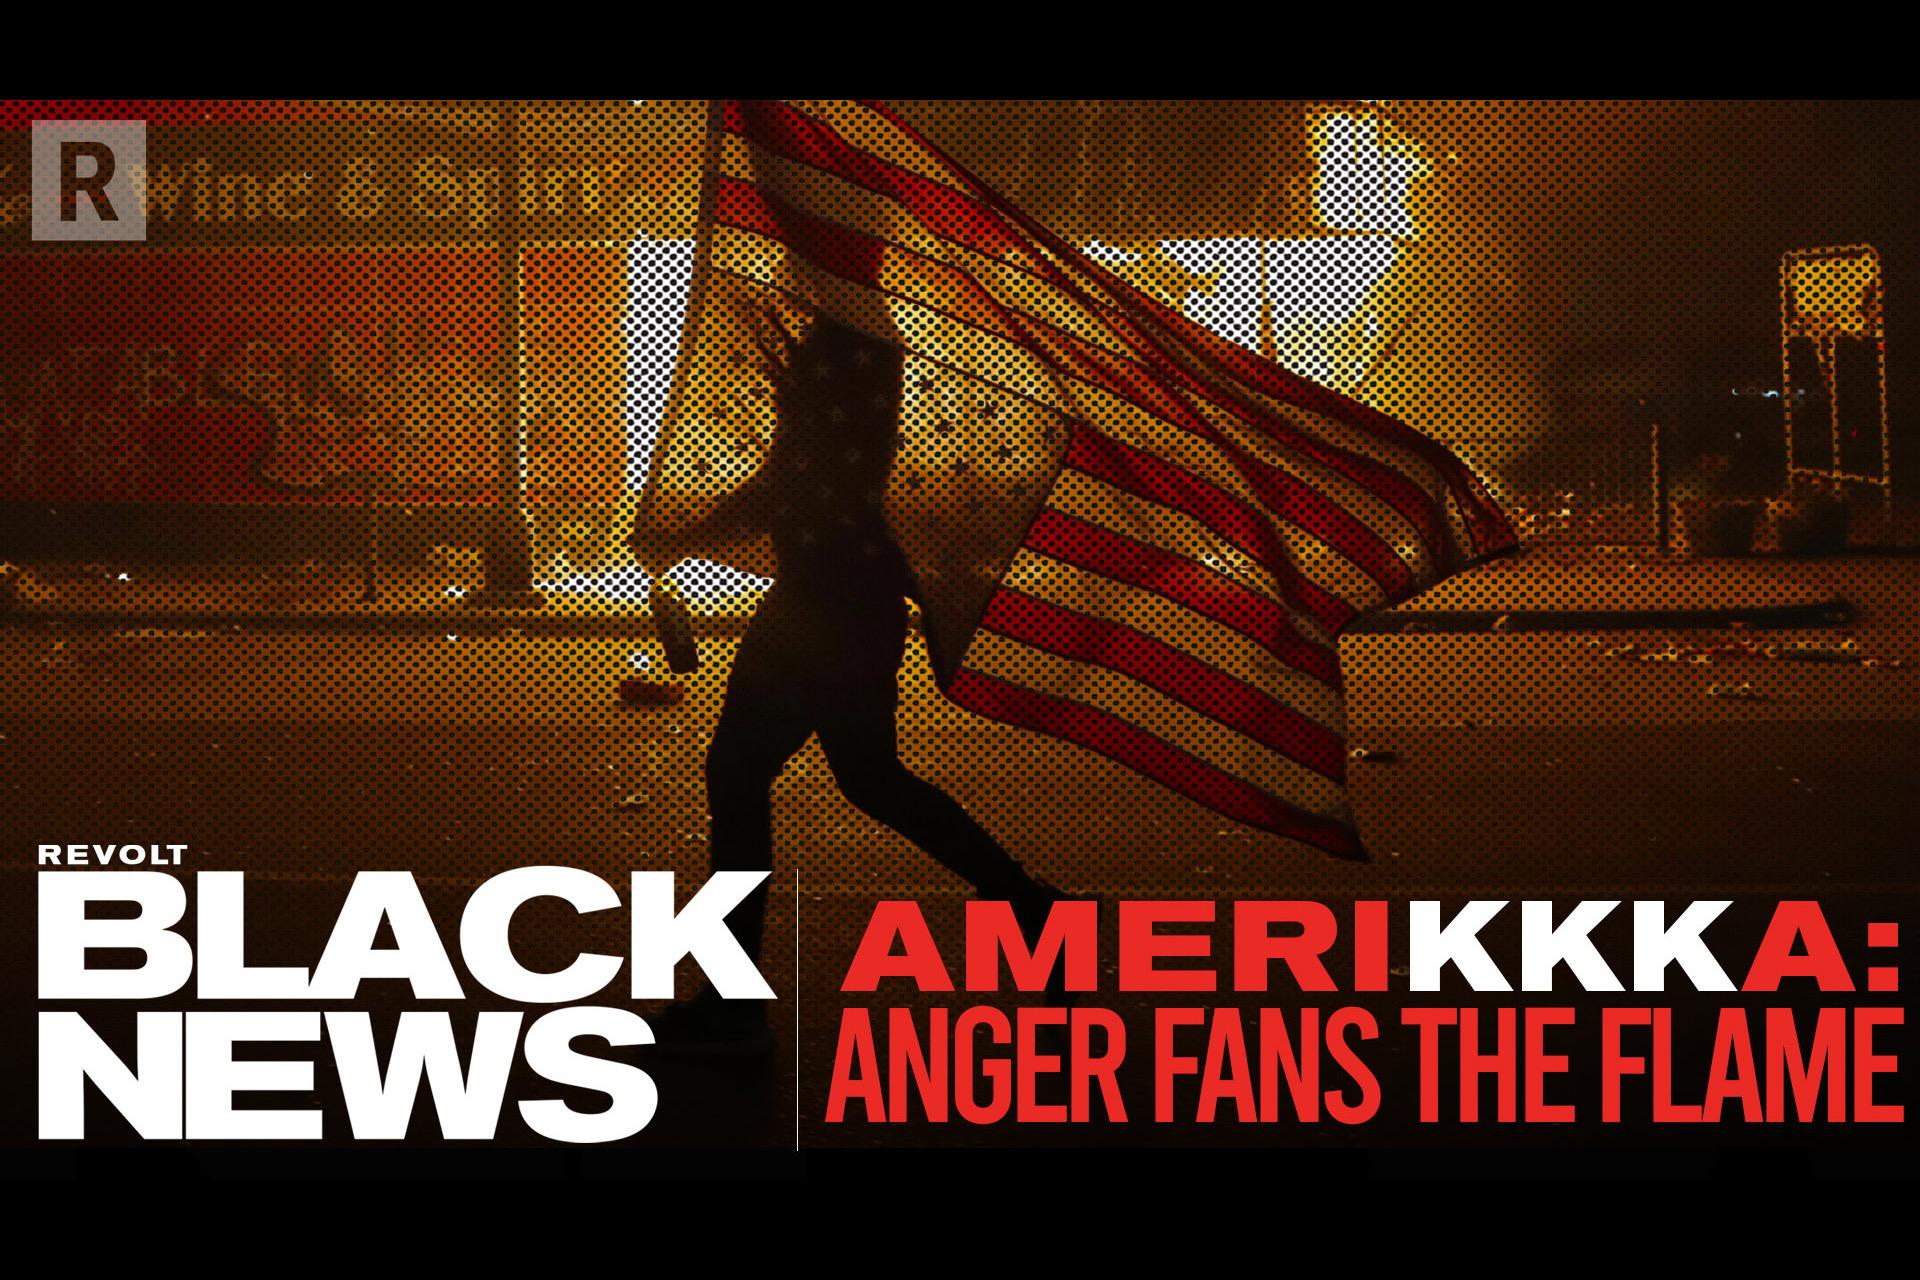 'REVOLT BLACK NEWS'